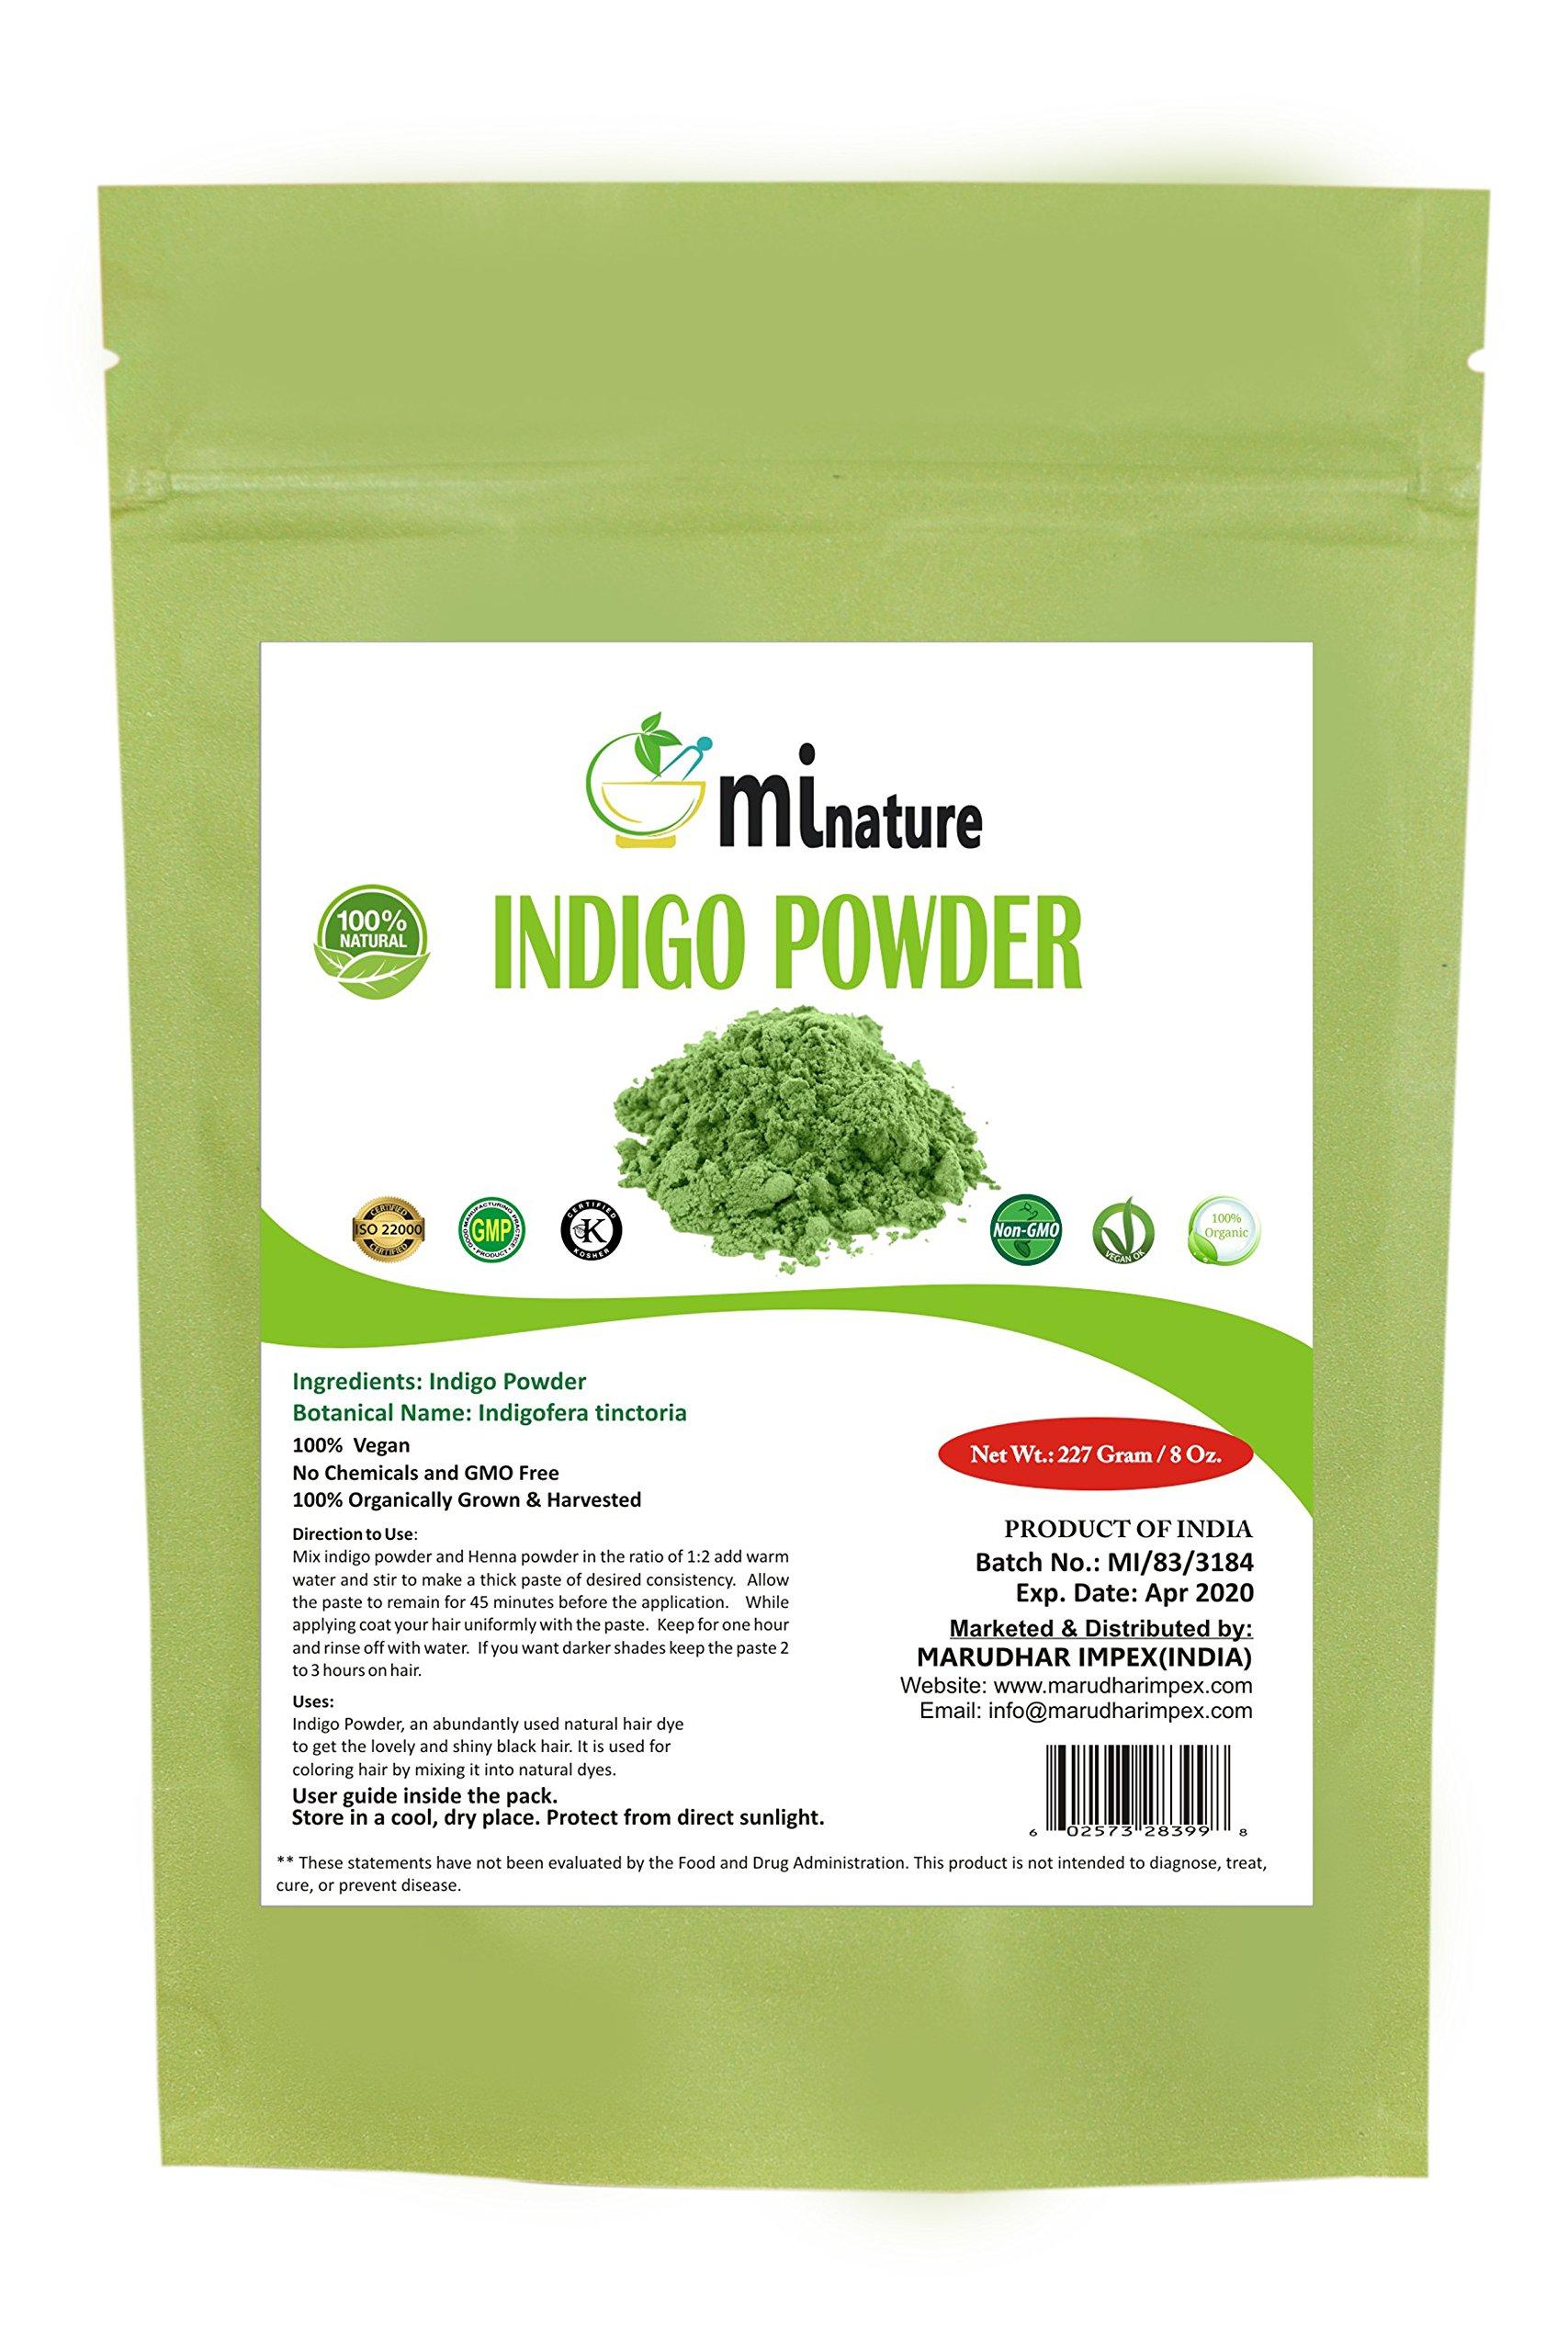 mi nature Indigo Powder -INDIGOFERA TINCTORIA,(100% NATURAL, ORGANICALLY GROWN) 1/2 LB (227 grams) RESEALABLE BAG